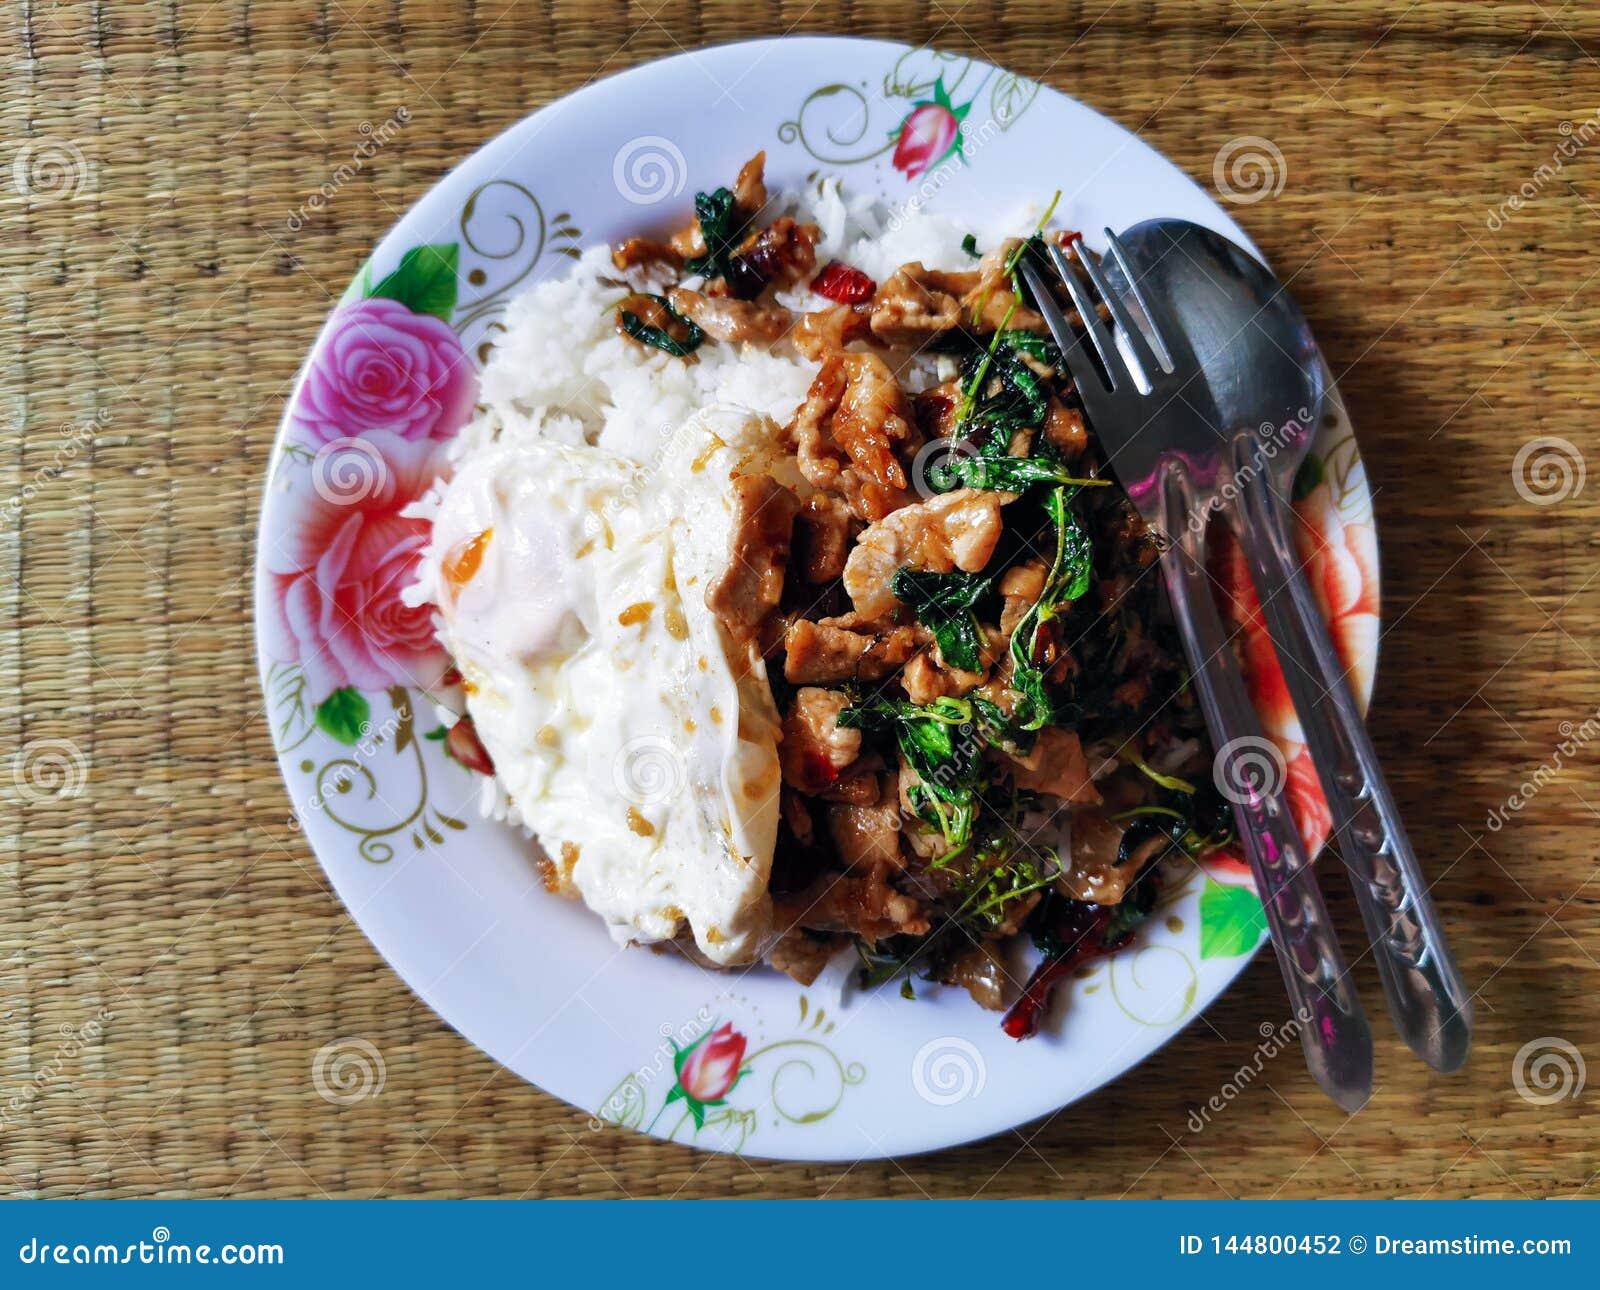 Sweet basil with pork, fried egg